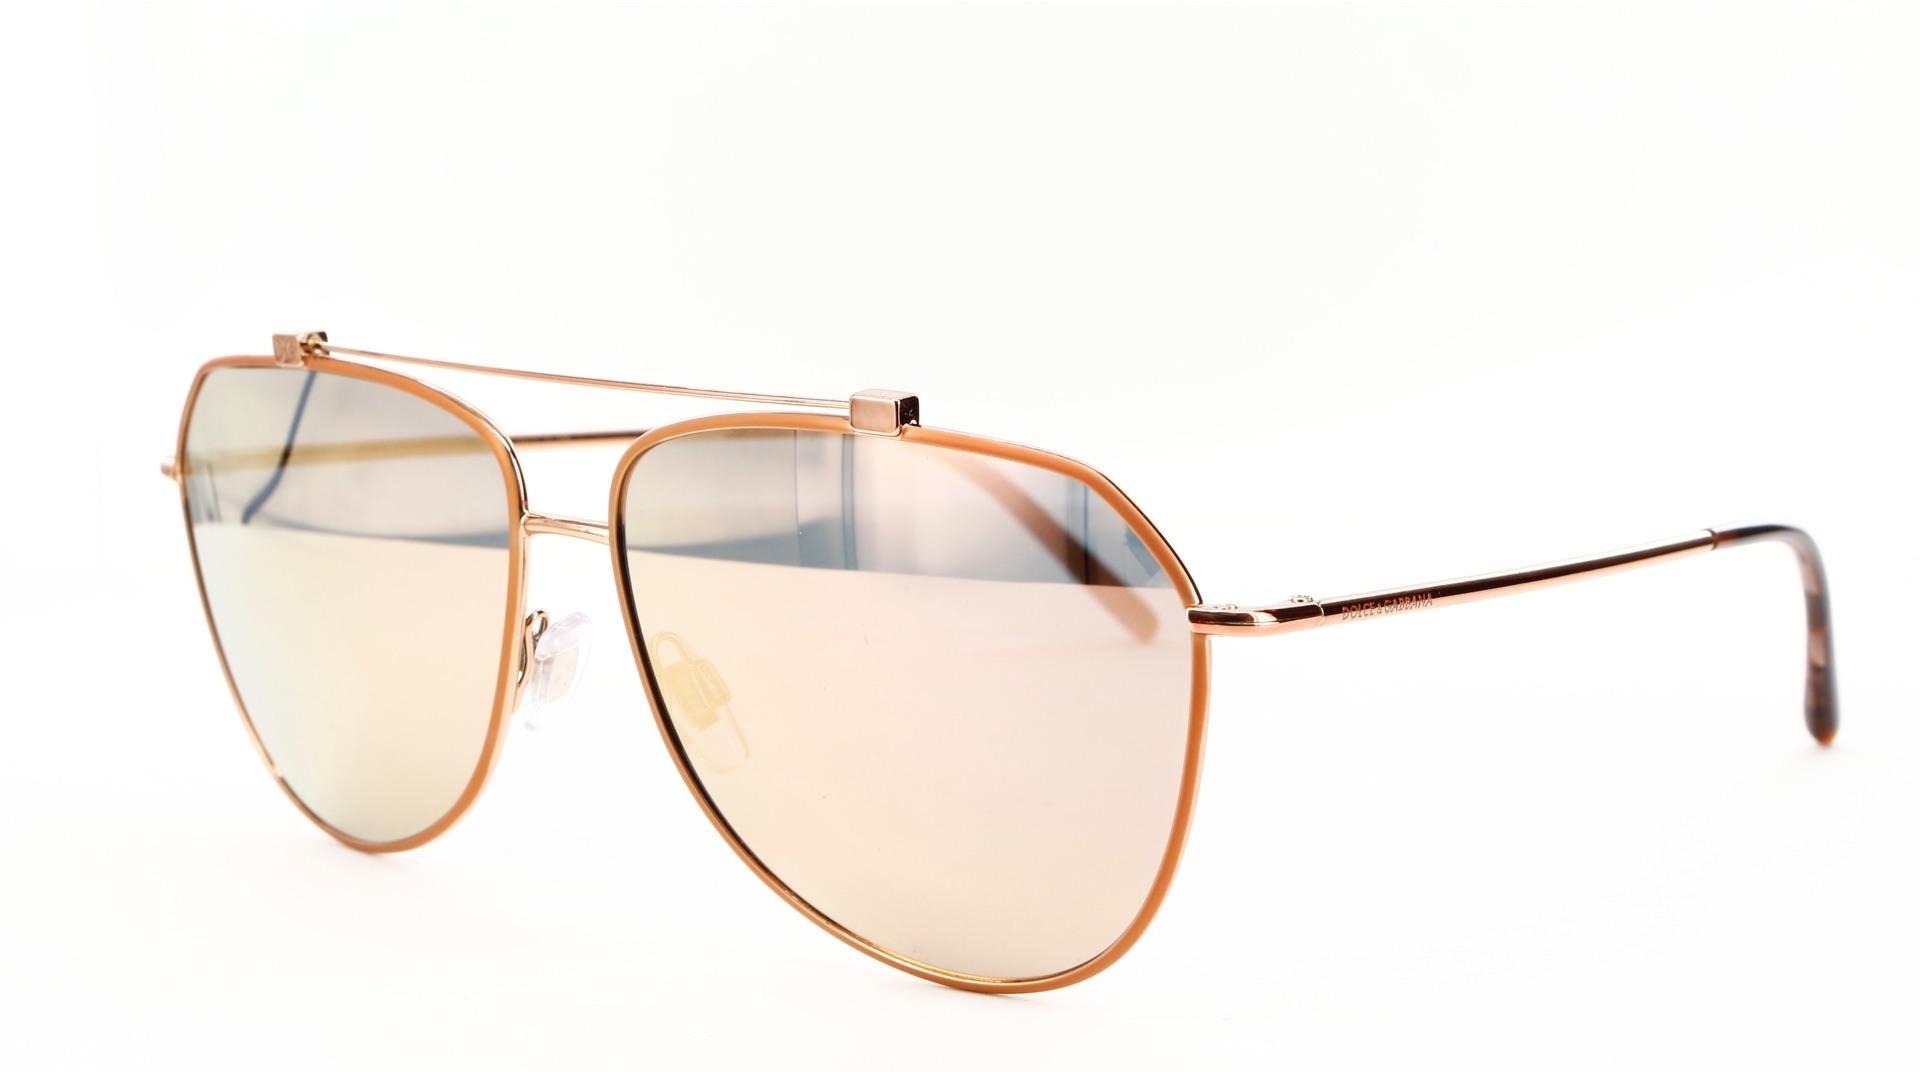 Dolce & Gabbana - ref: 79400